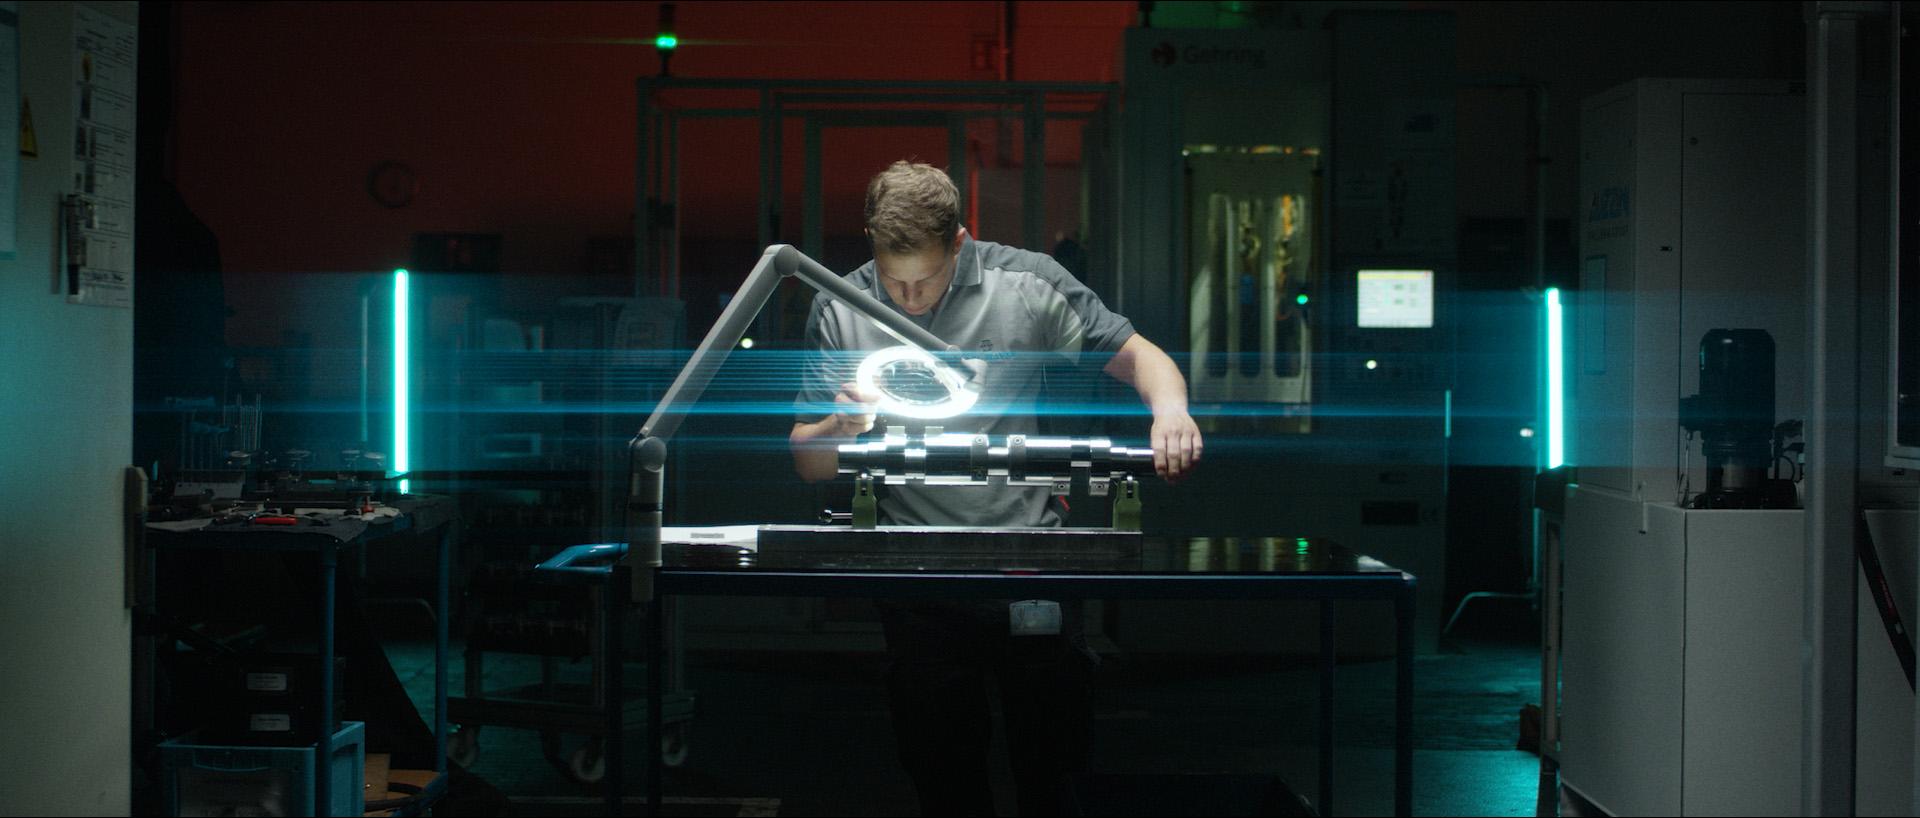 Karl-Mayer-Texture-Machine-Production-Textile_01.jpg